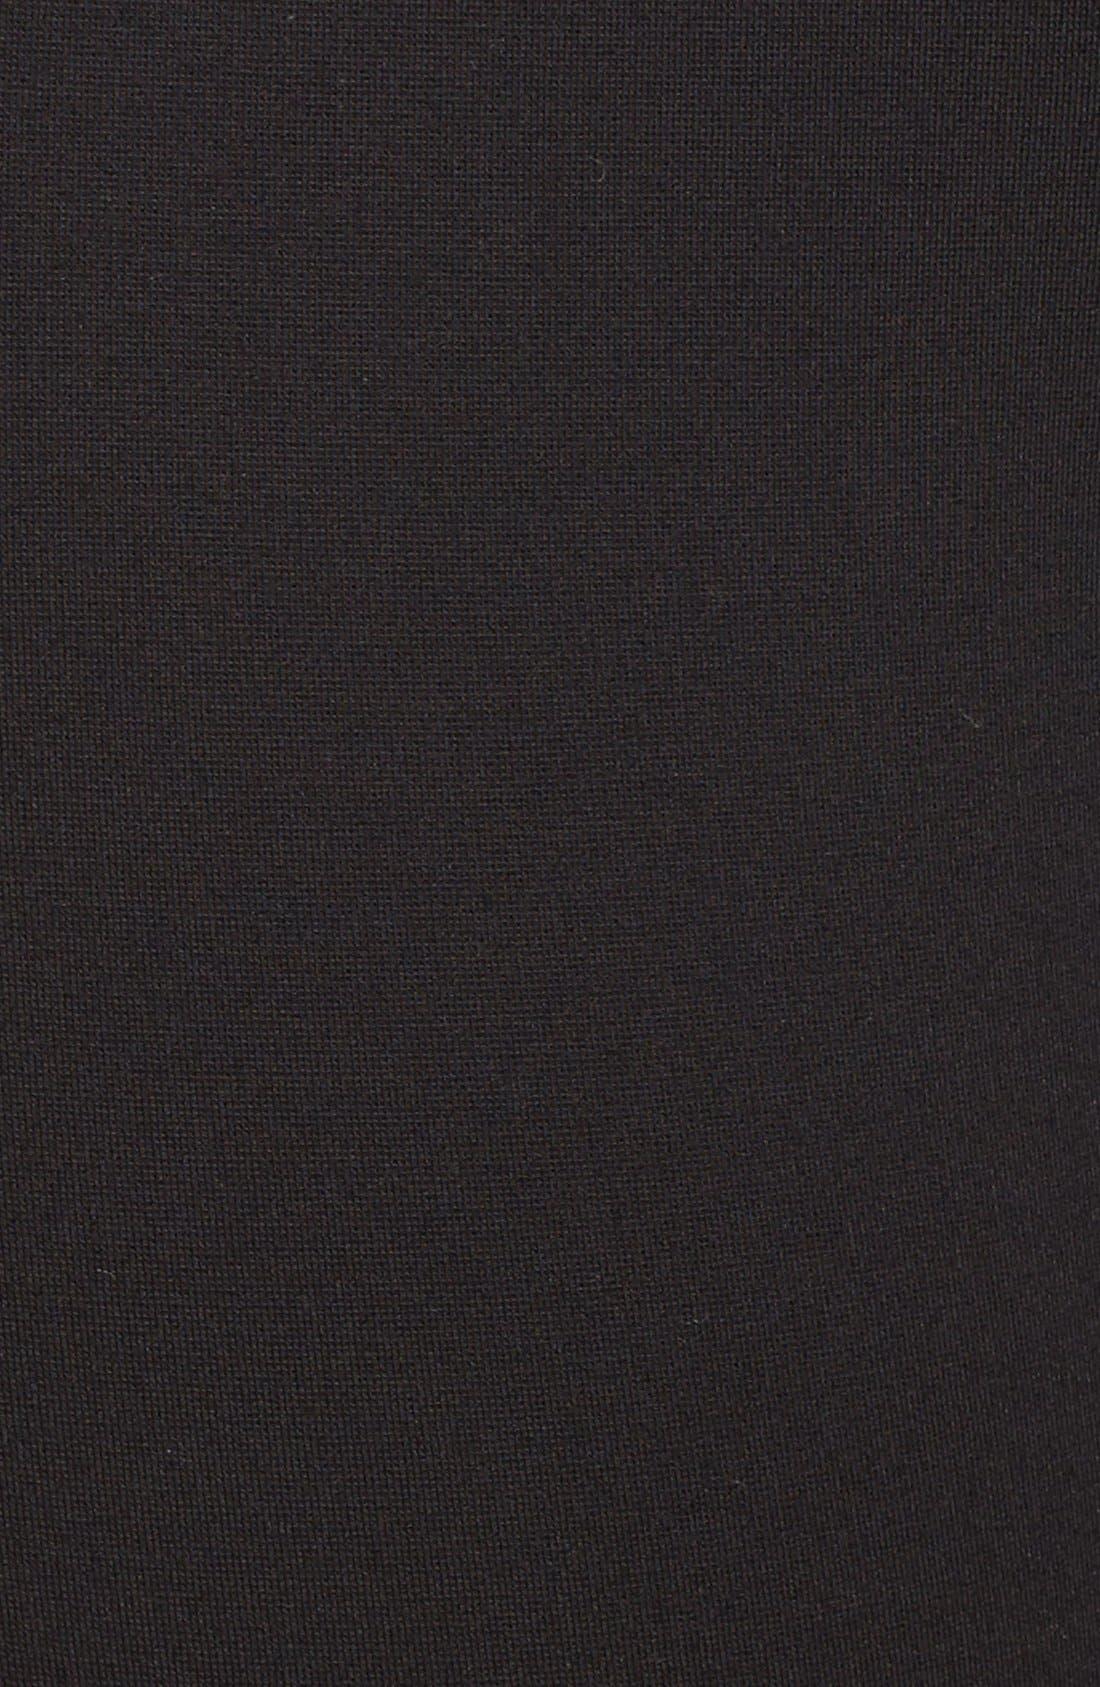 Seam Detail Crop Ponte Leggings,                             Alternate thumbnail 8, color,                             Black